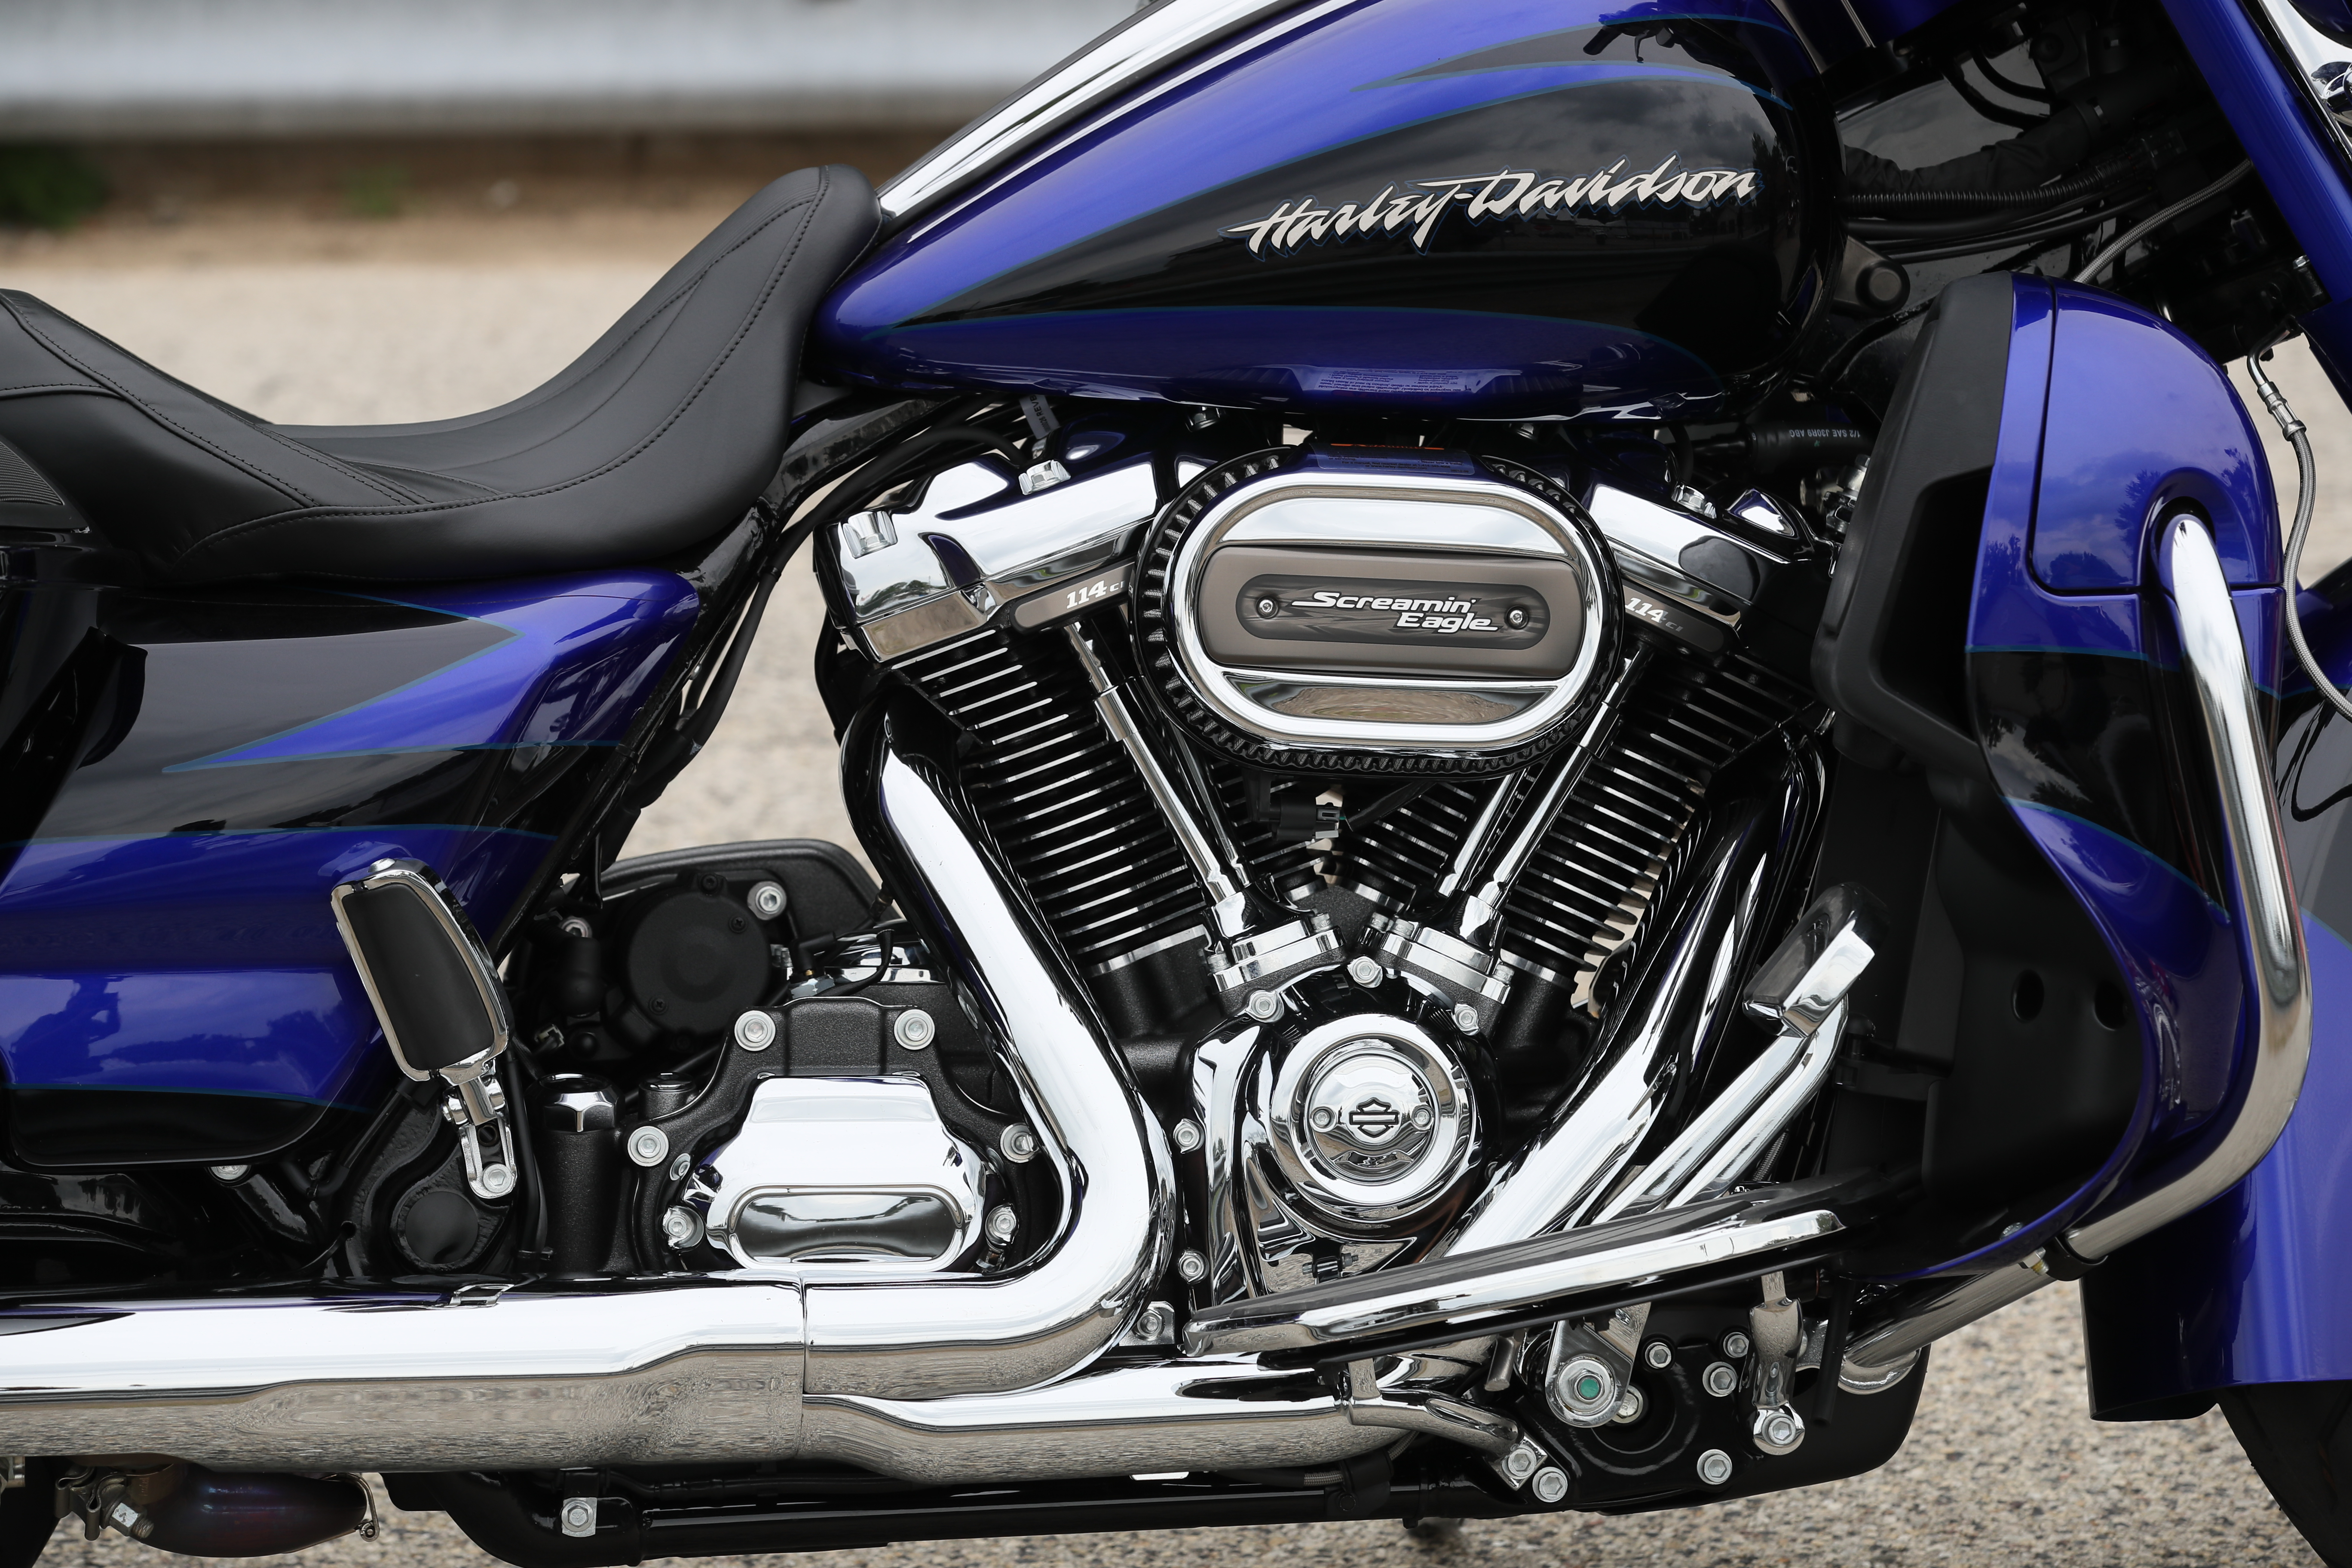 Harley-Davidson CVO Street Glide and Street Glide Speci    | Visordown